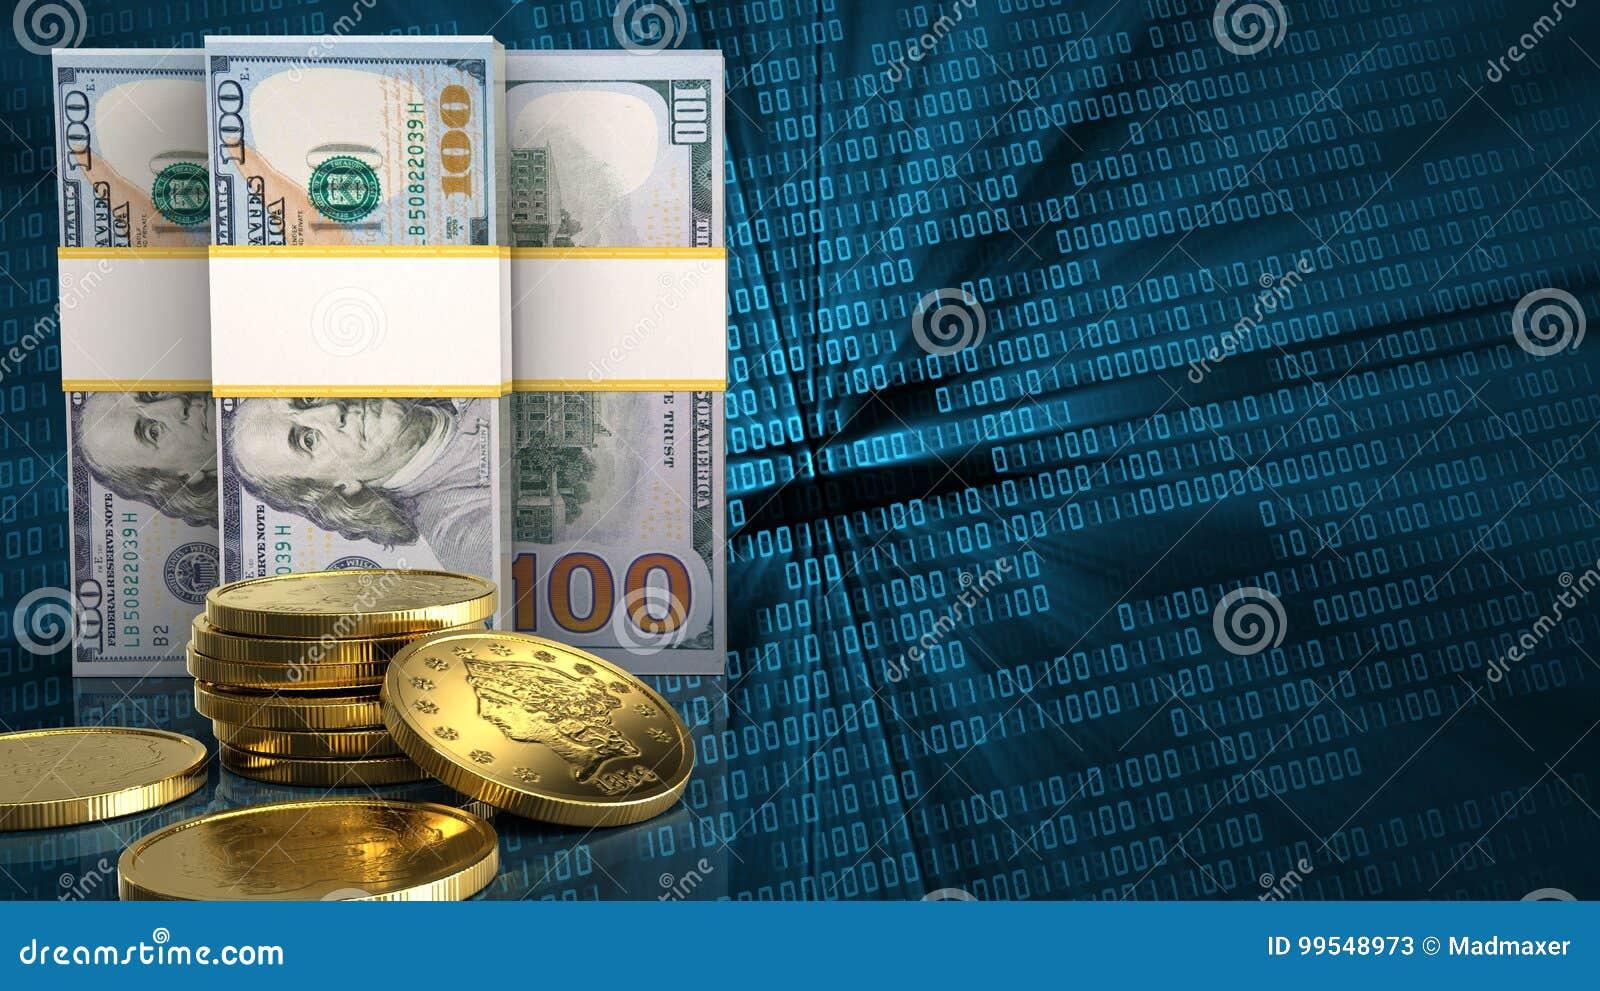 Top 10 opțiuni de tranzacționare binare